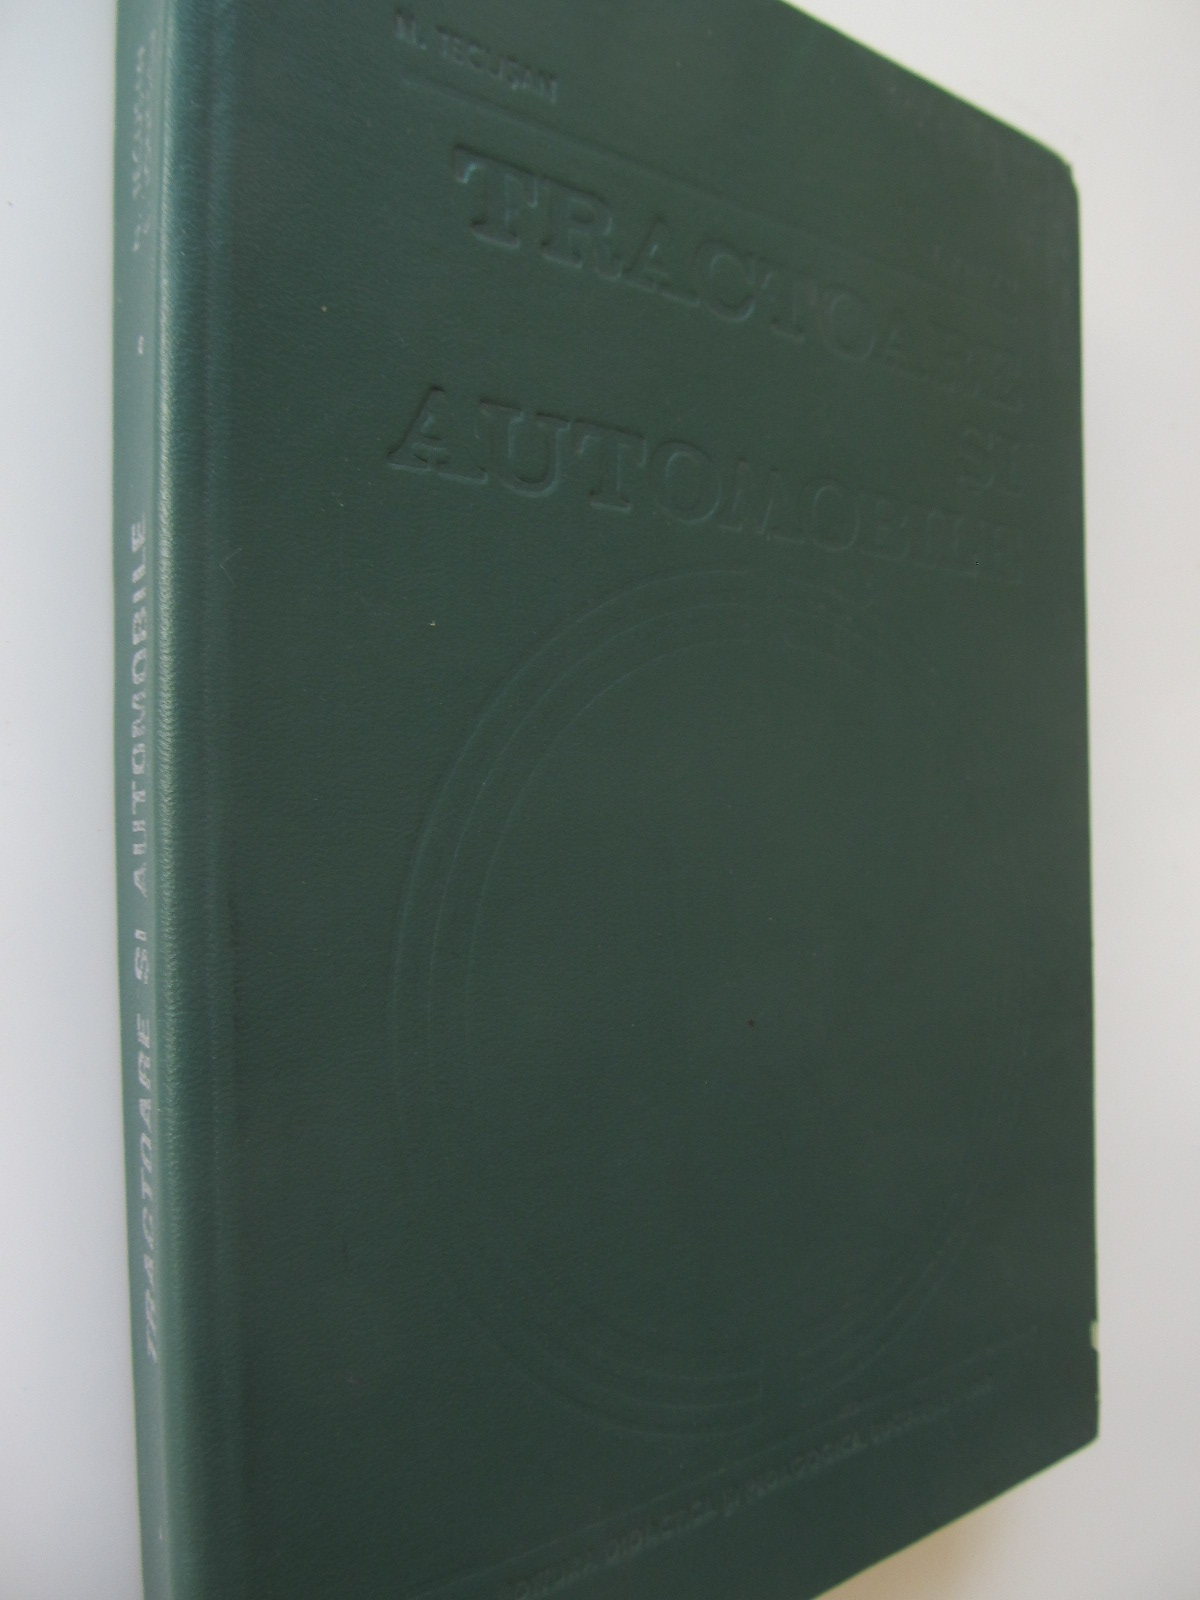 Tractoare si automobile - Nicolae Tecusan , Enache Ionescu   Detalii carte